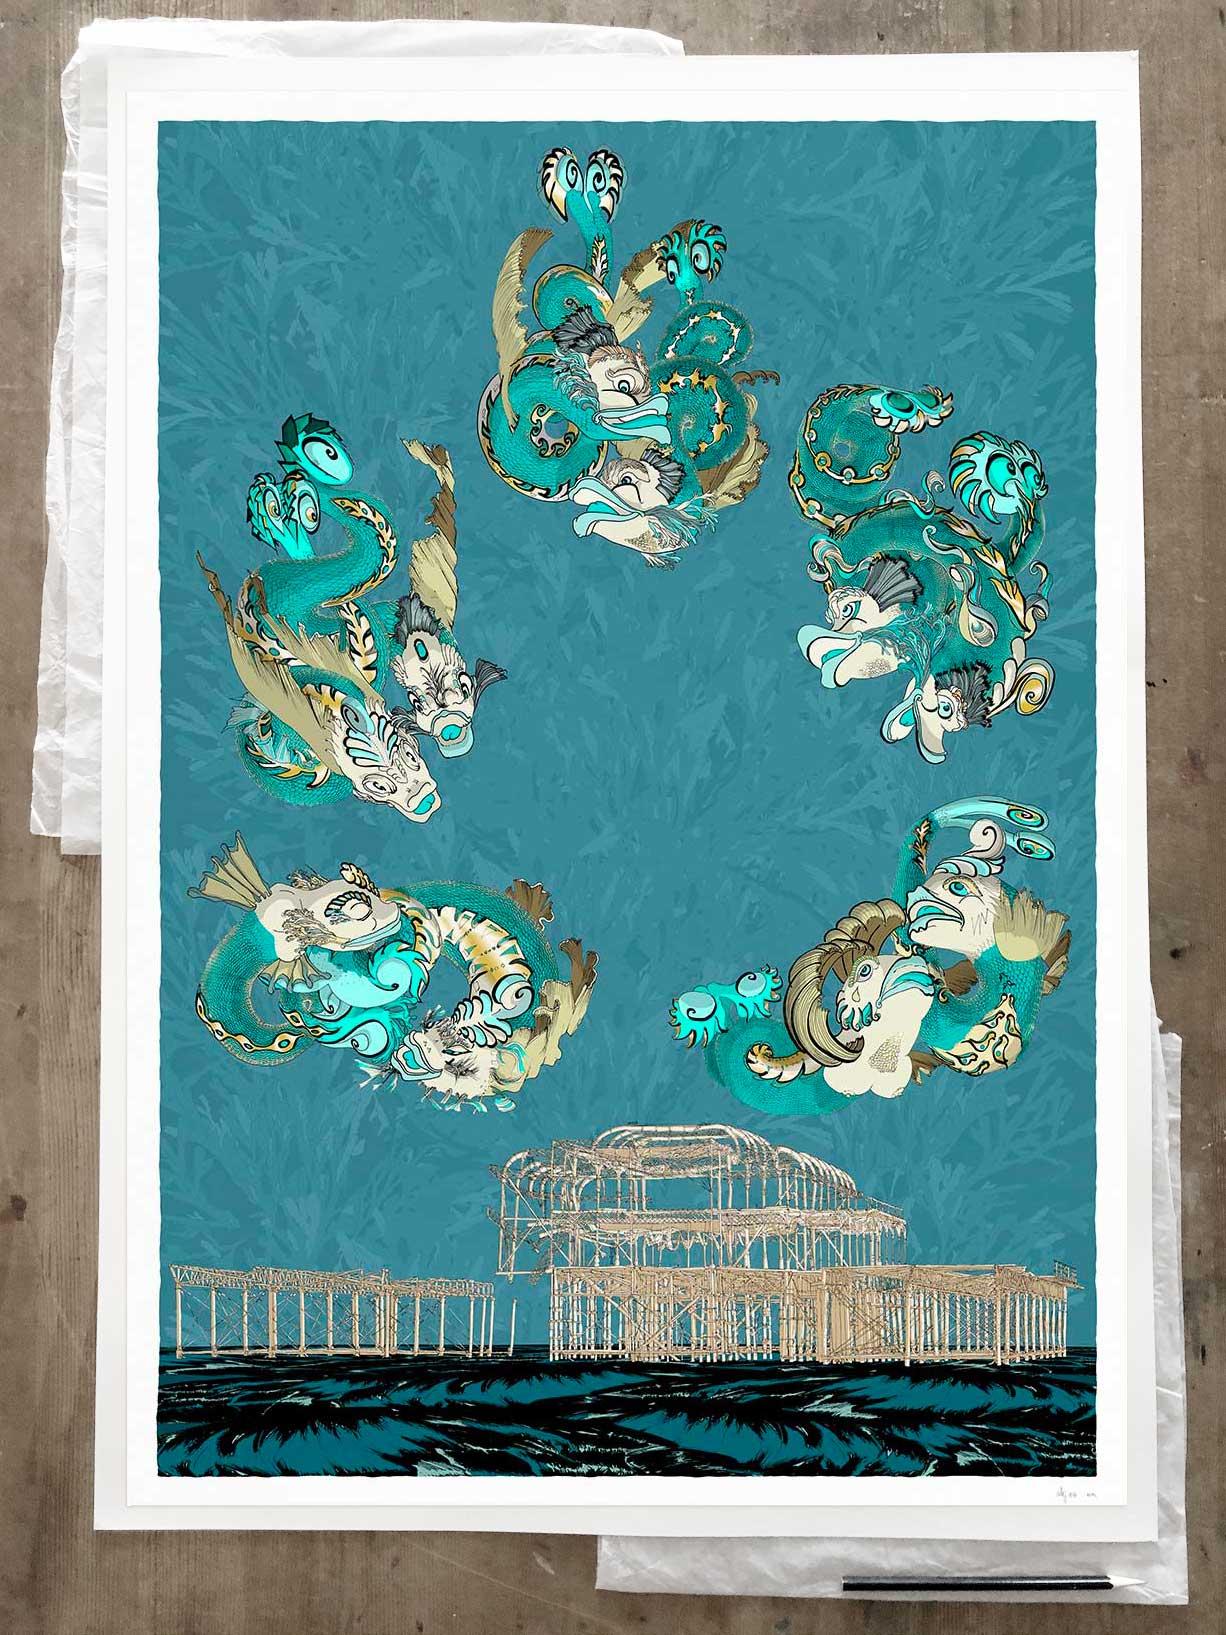 Fine art print by artist alej ez titled Dolphins of Brighton West Pier